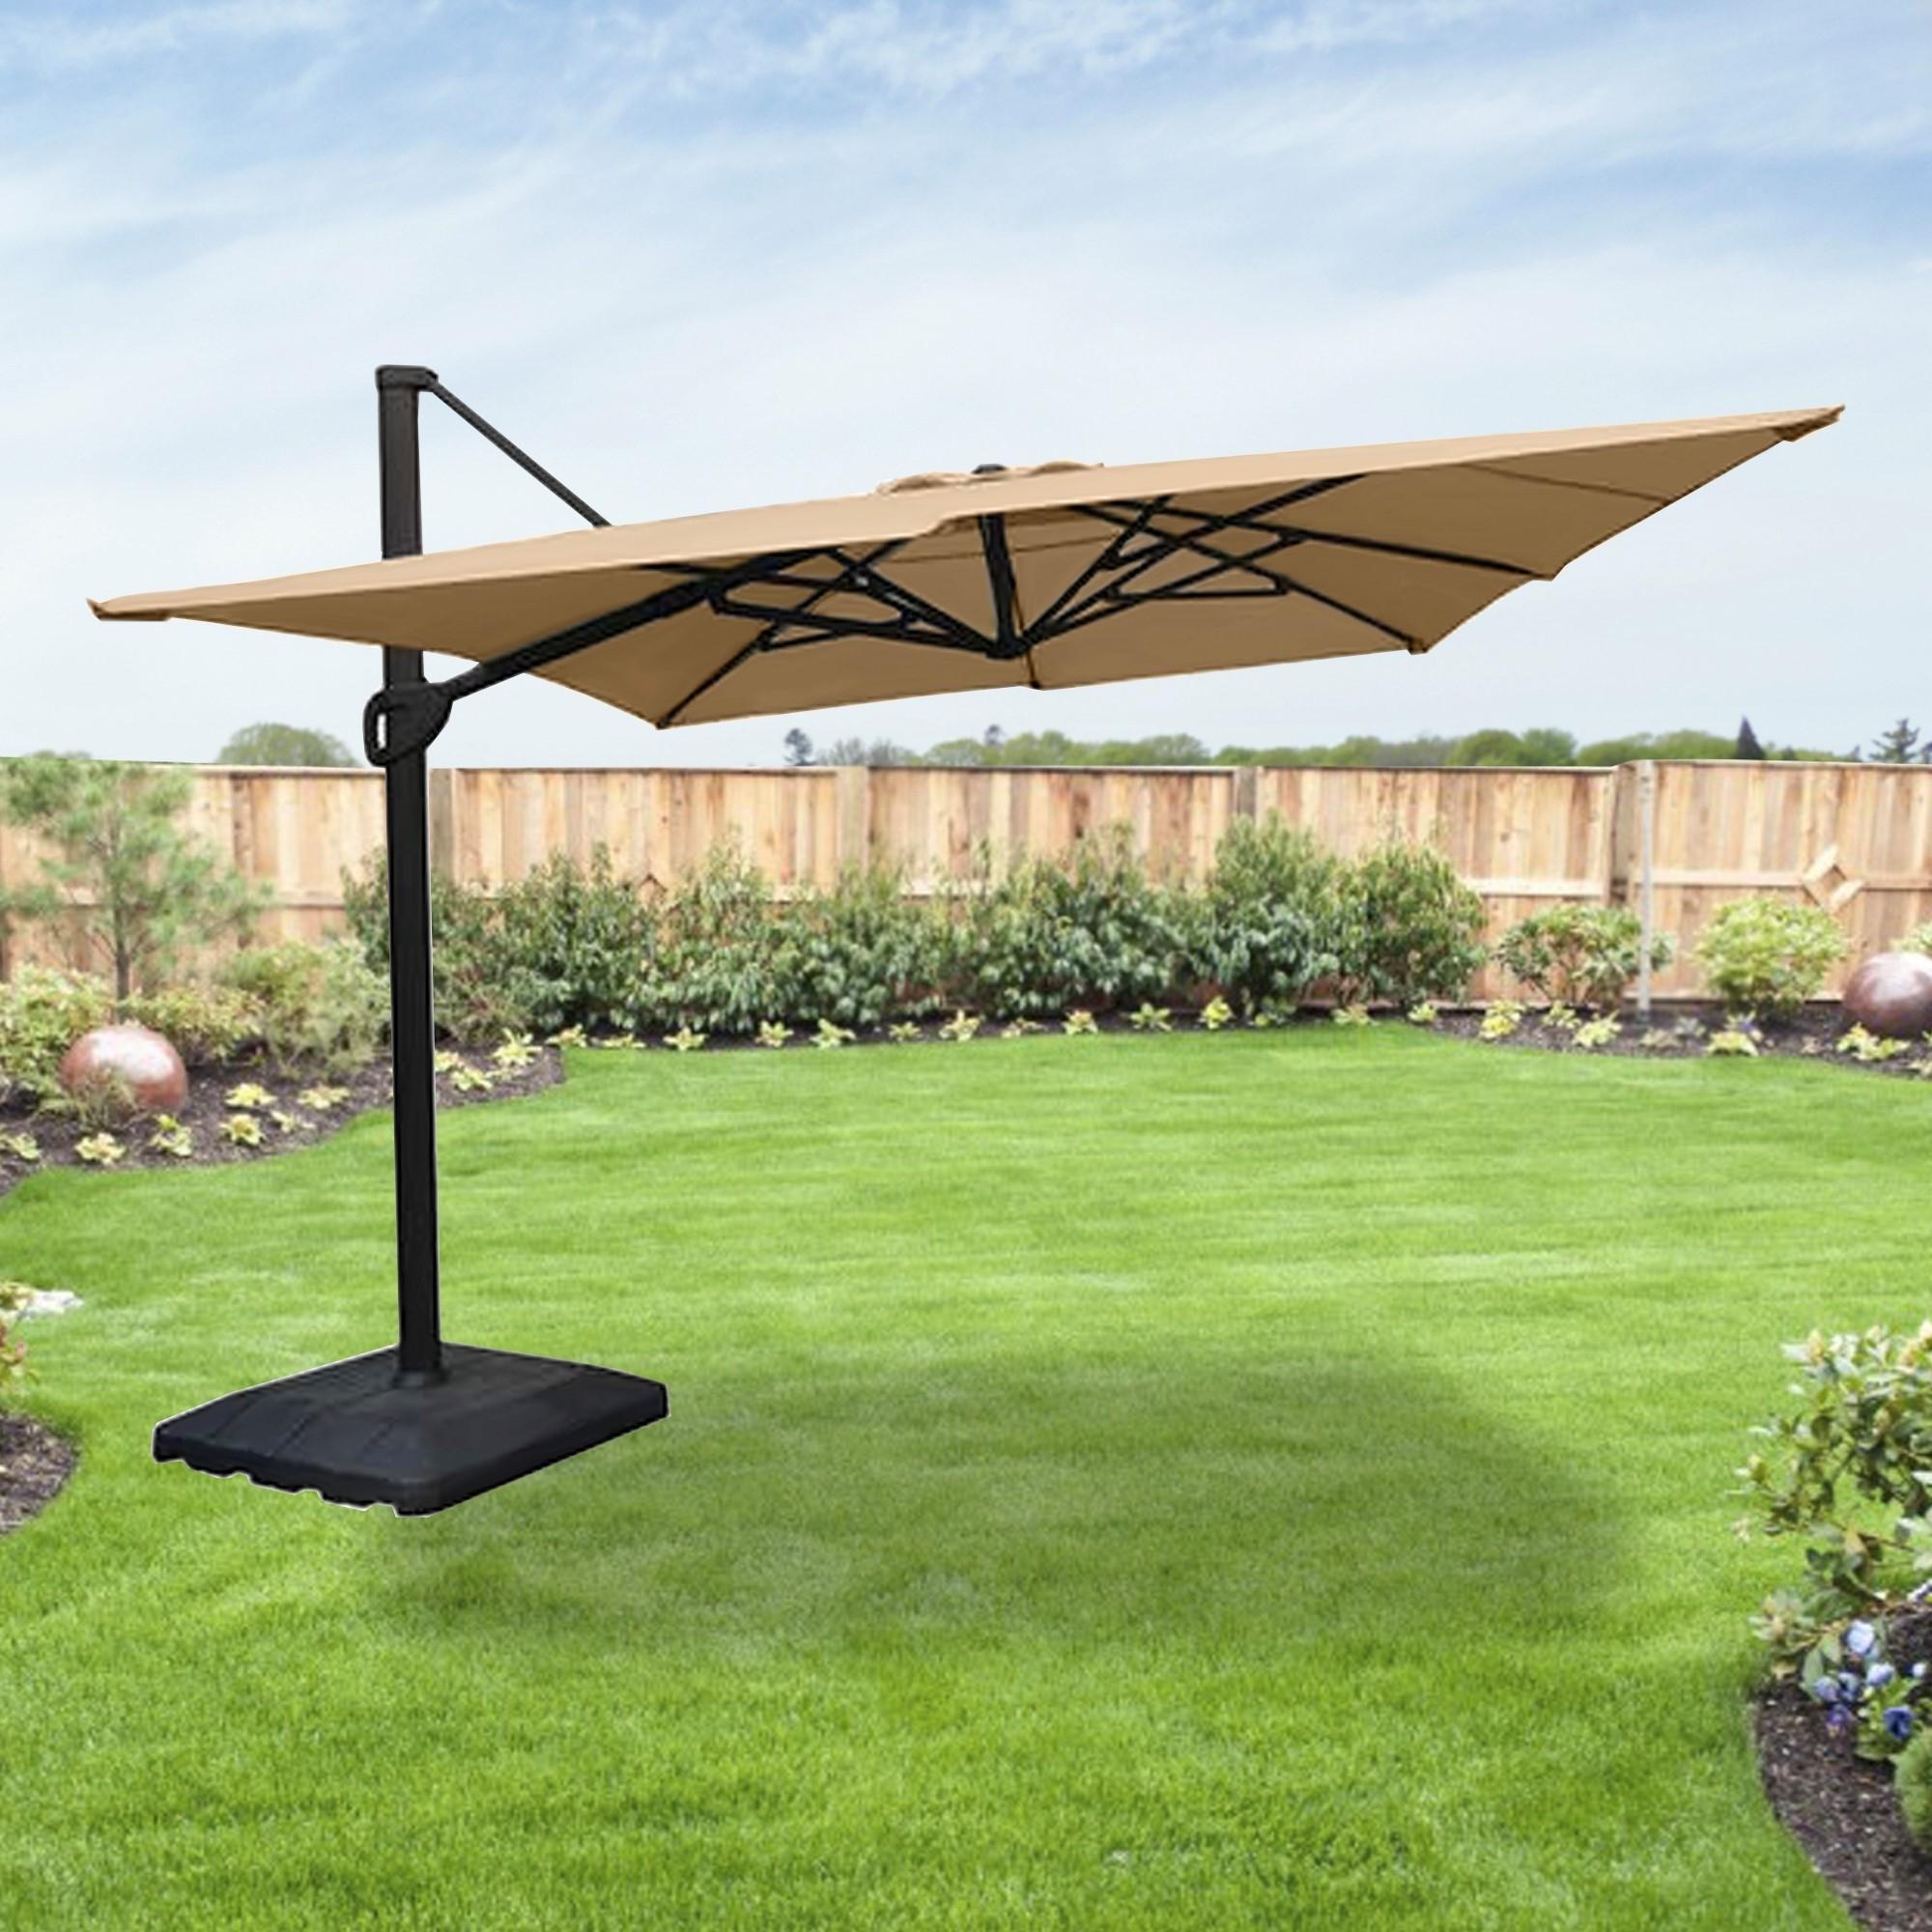 Most Current Menards Patio Umbrellas In Replacement Umbrella Canopy – Garden Winds (View 15 of 20)